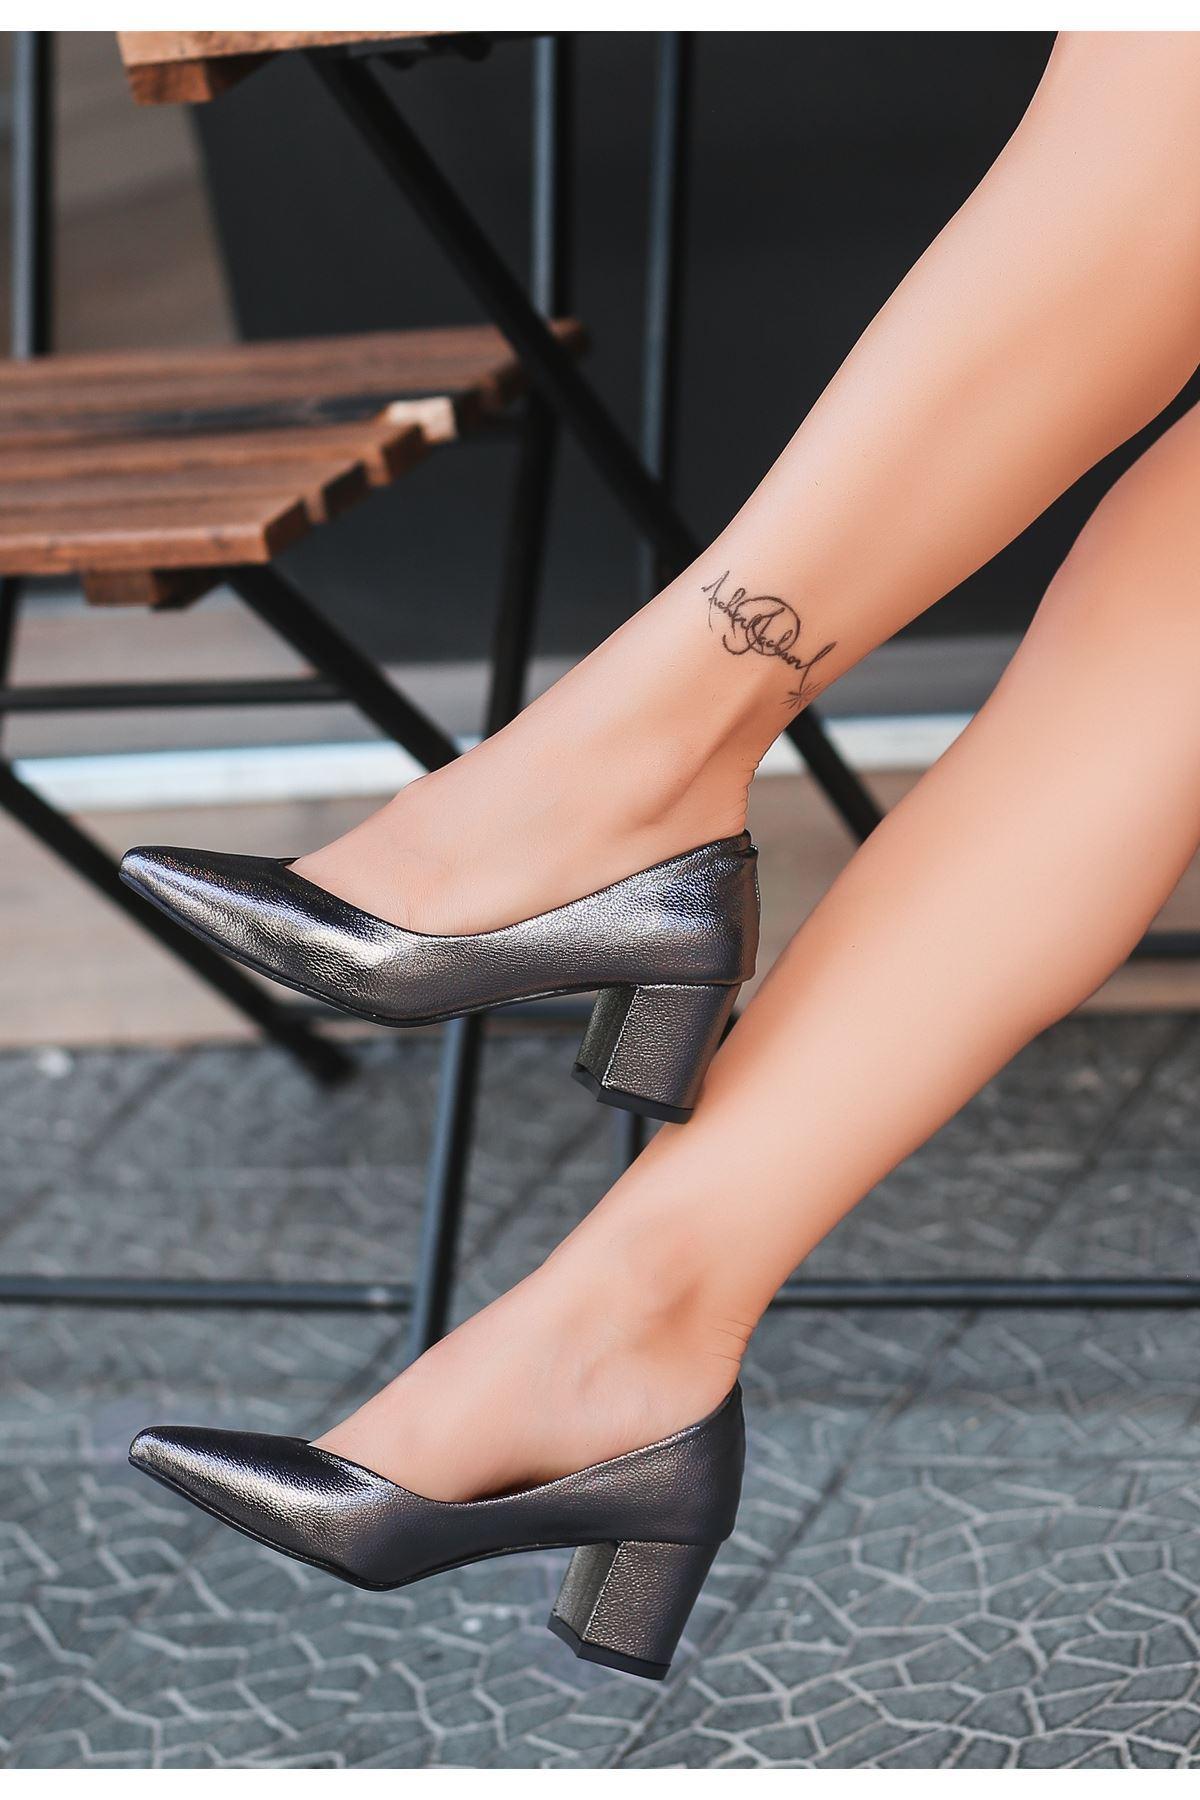 Manina Platin Cilt Desenli Topuklu Ayakkabı